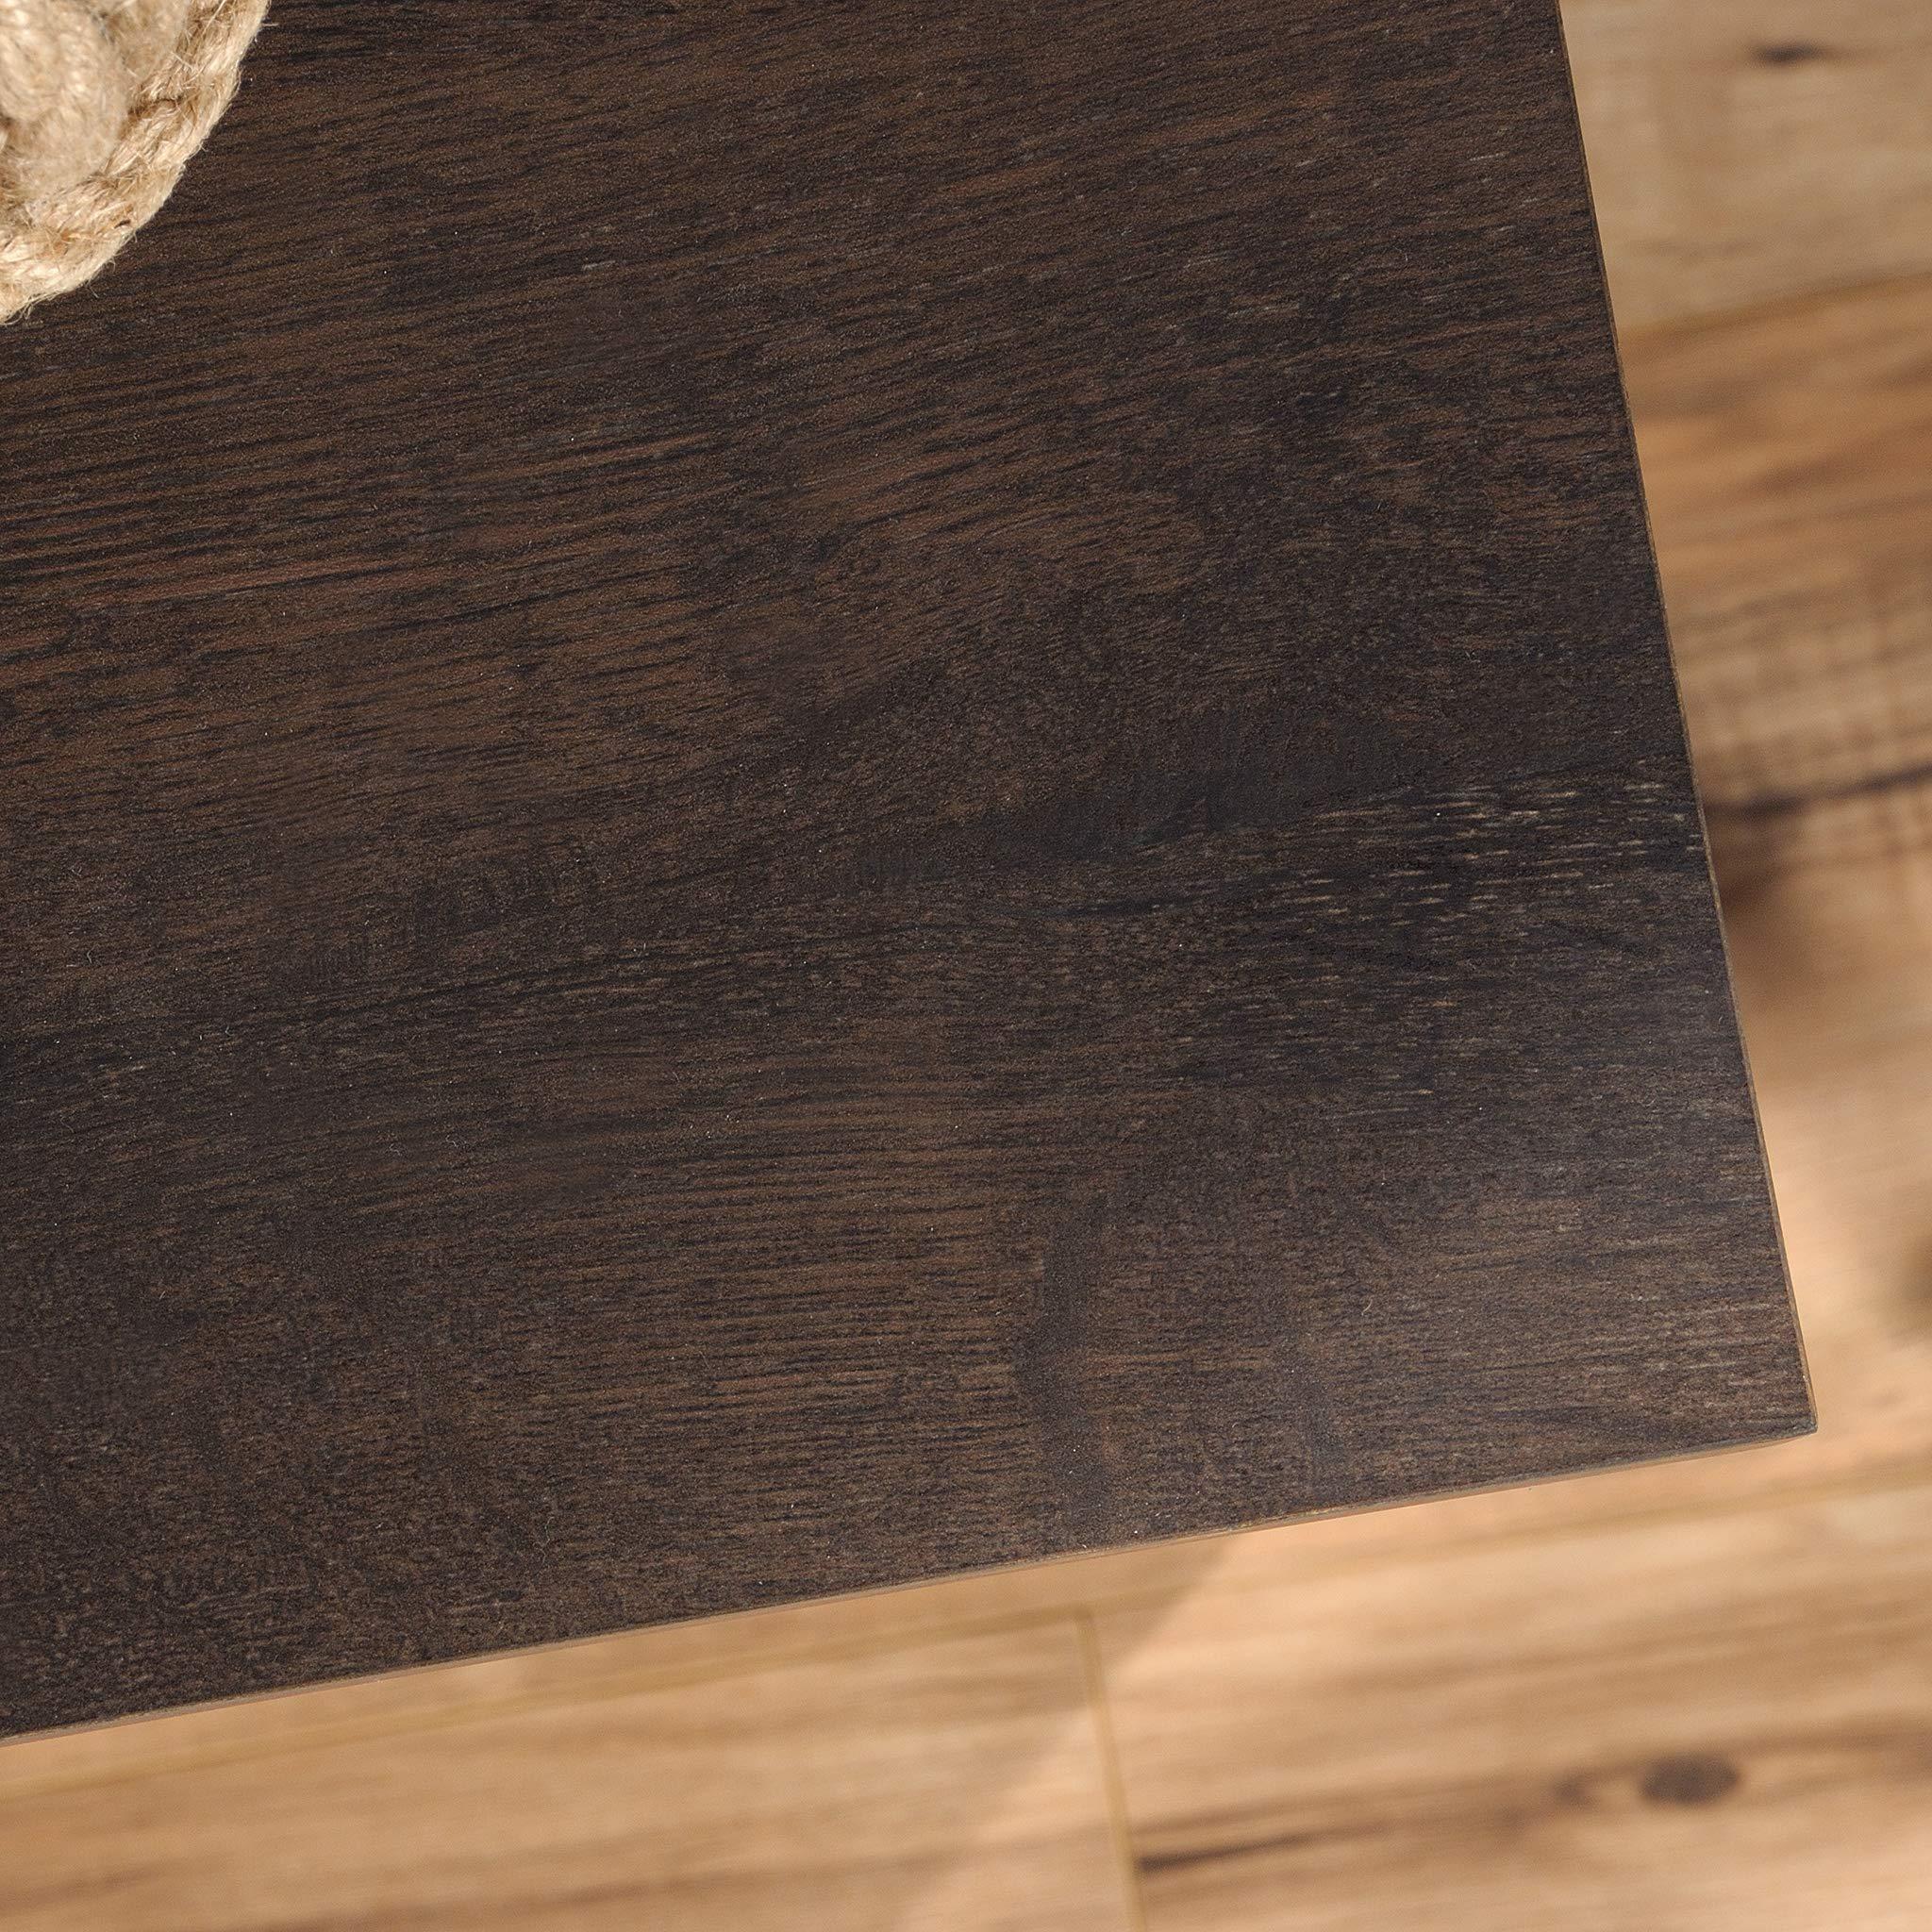 Sauder 422981 Costa Library Base, L: 31.30'' x W: 14.41'' x H: 30.00'', Coffee Oak Finish by Sauder (Image #8)